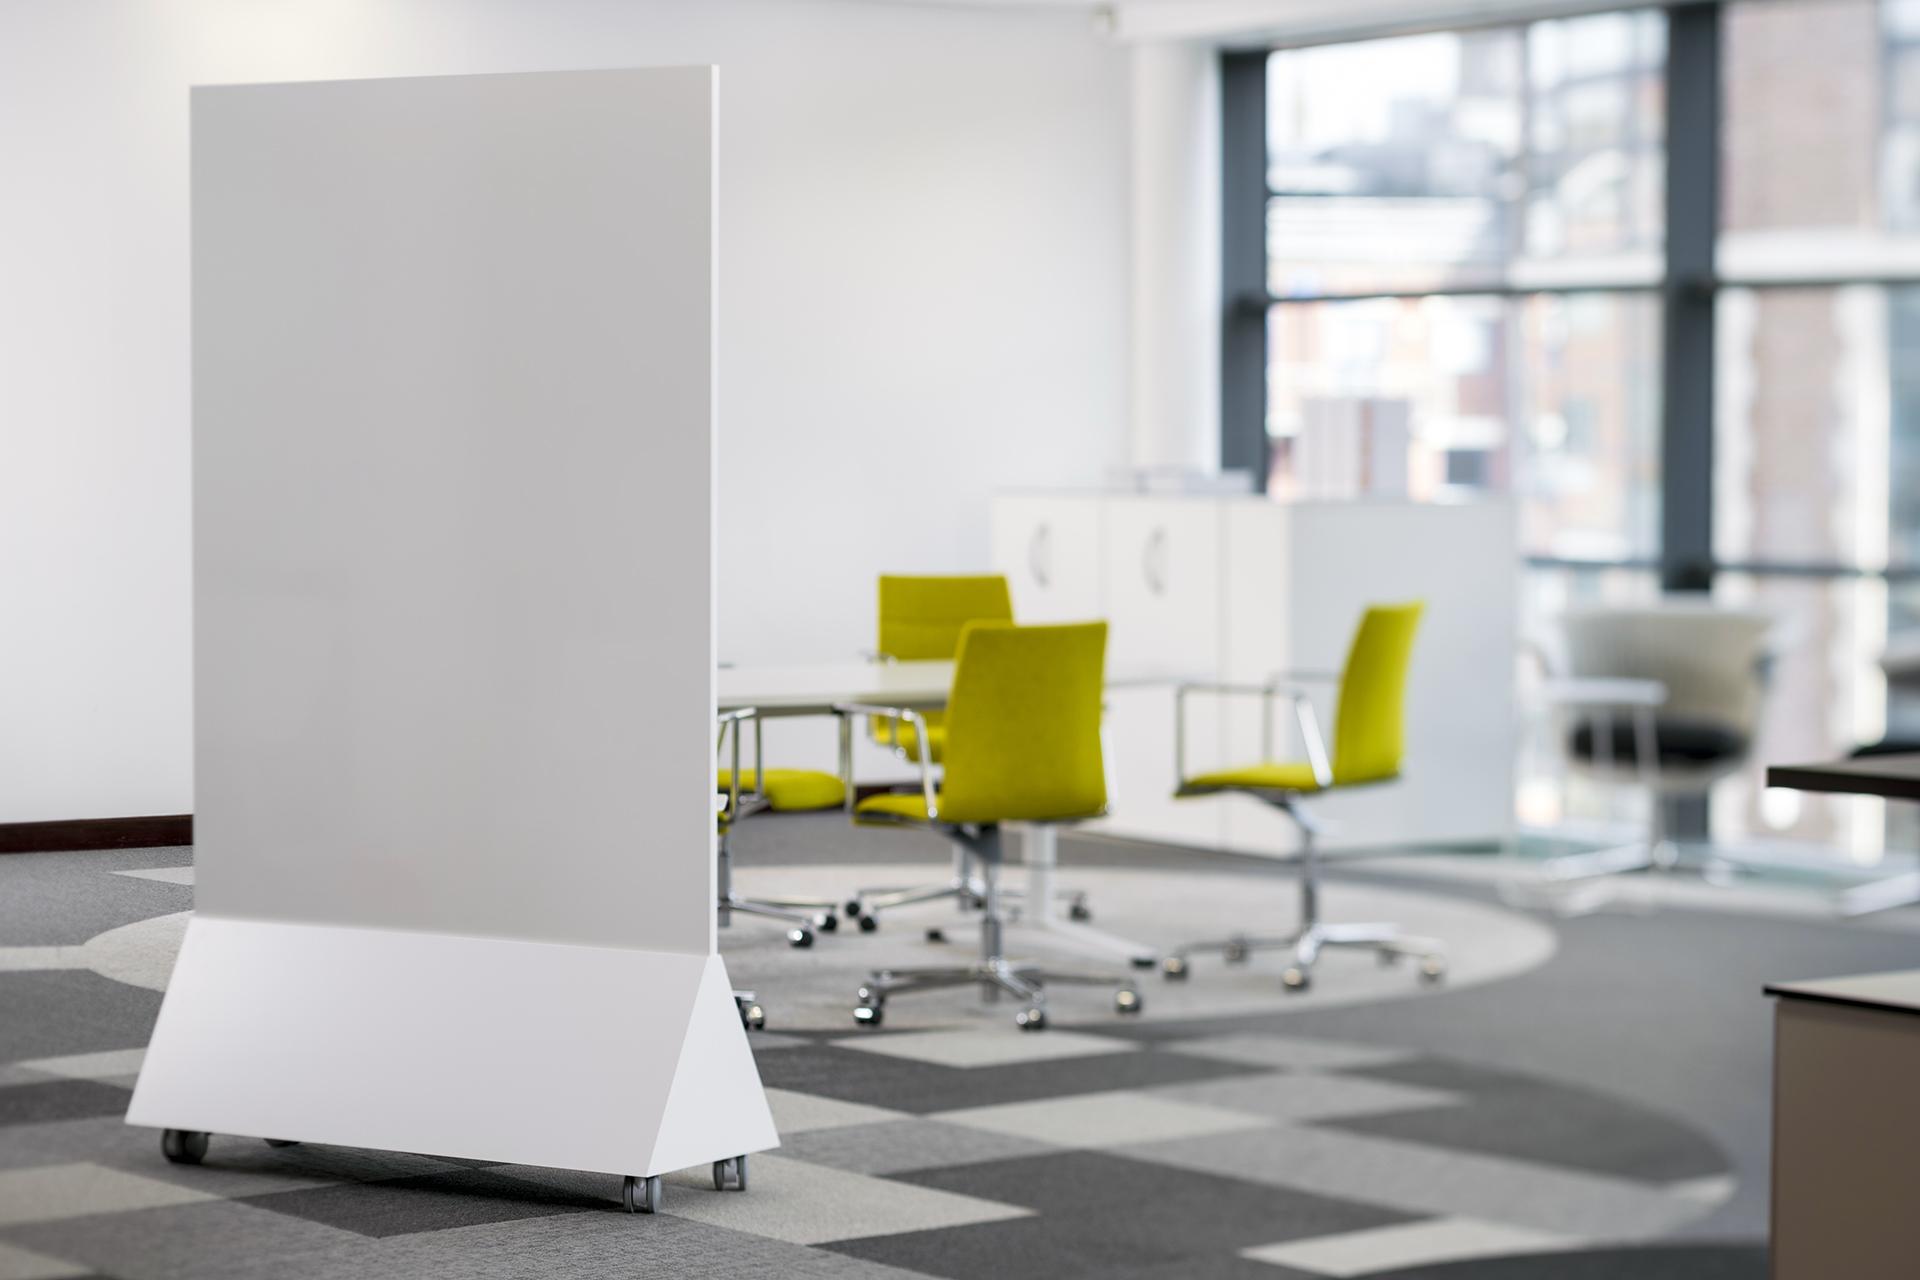 ThinkingWall Freestander mobile whiteboard